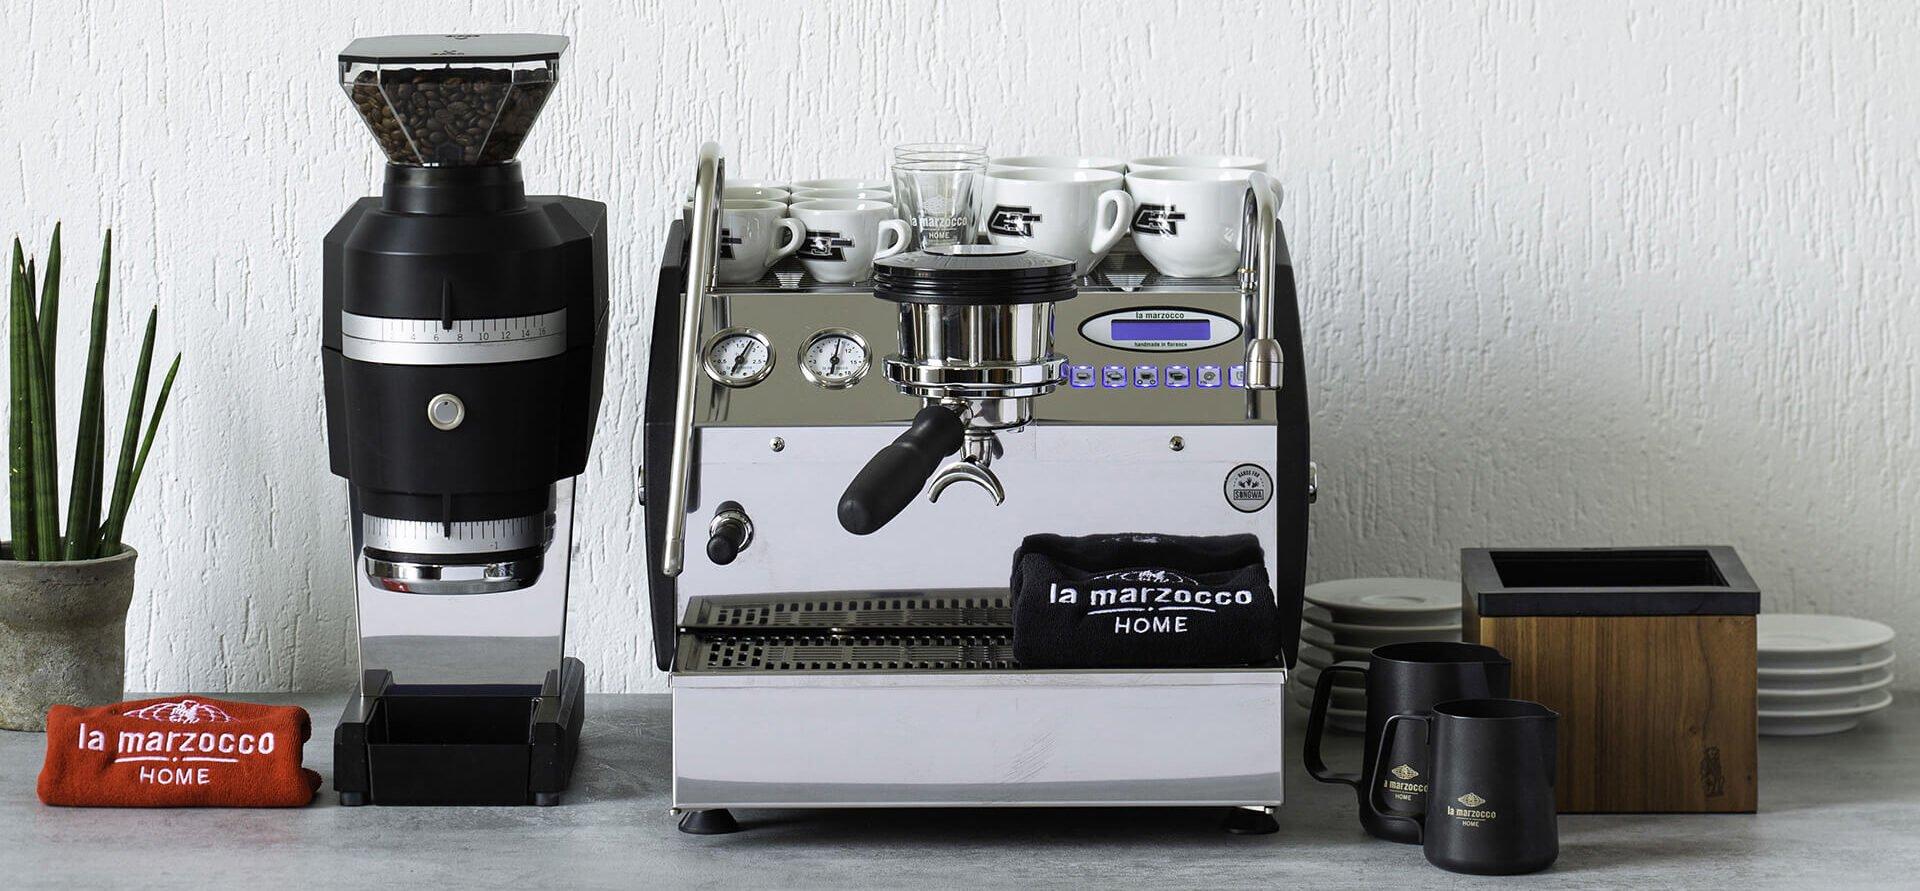 Horecava 2020 LaMarzocco koffiemolen voor thuis